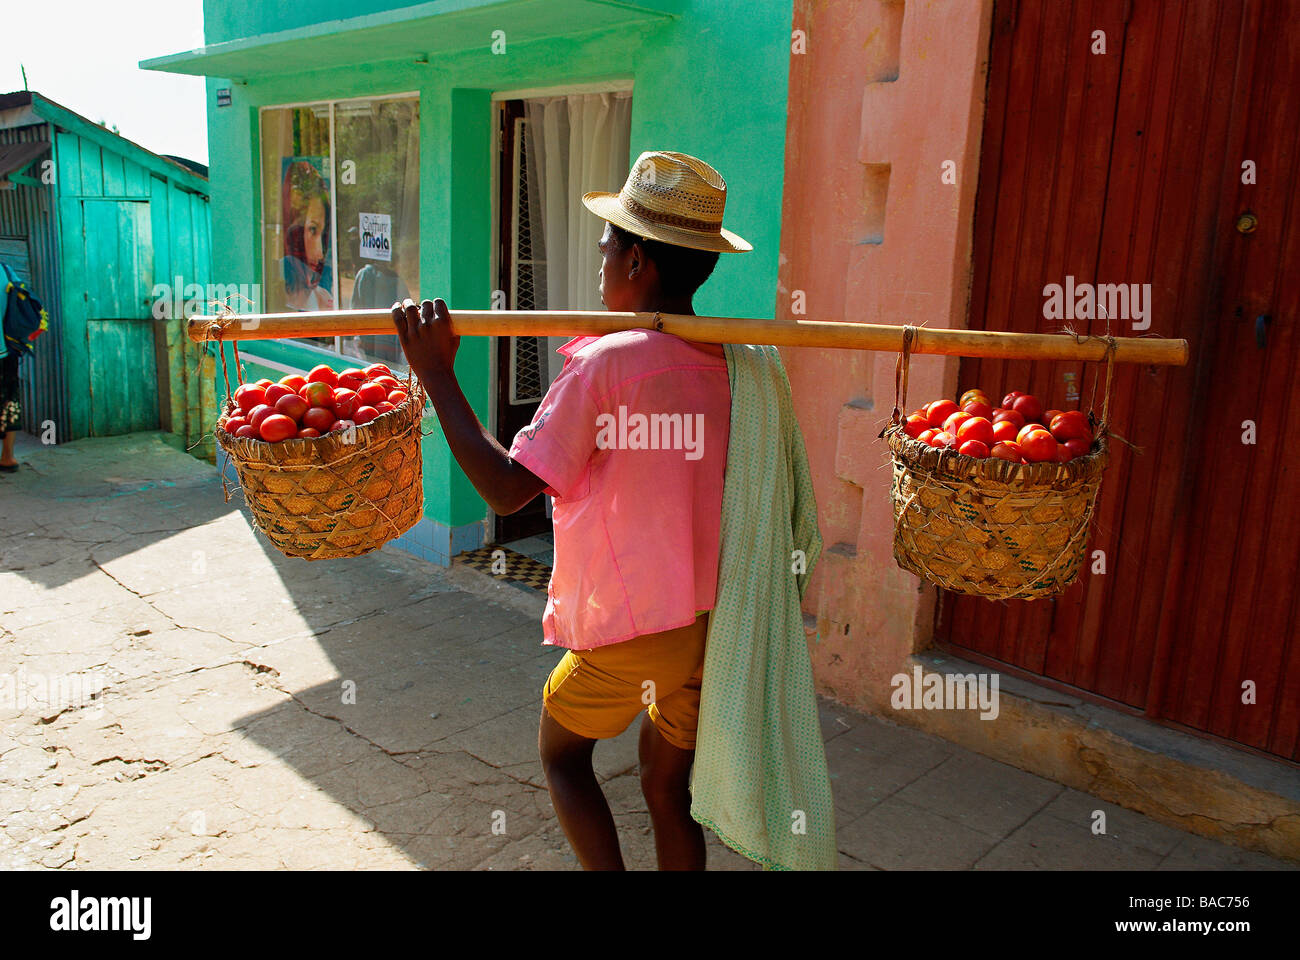 Madagascar, Alta Matsiatra Región, Fianarantsoa, portador de tomate Imagen De Stock